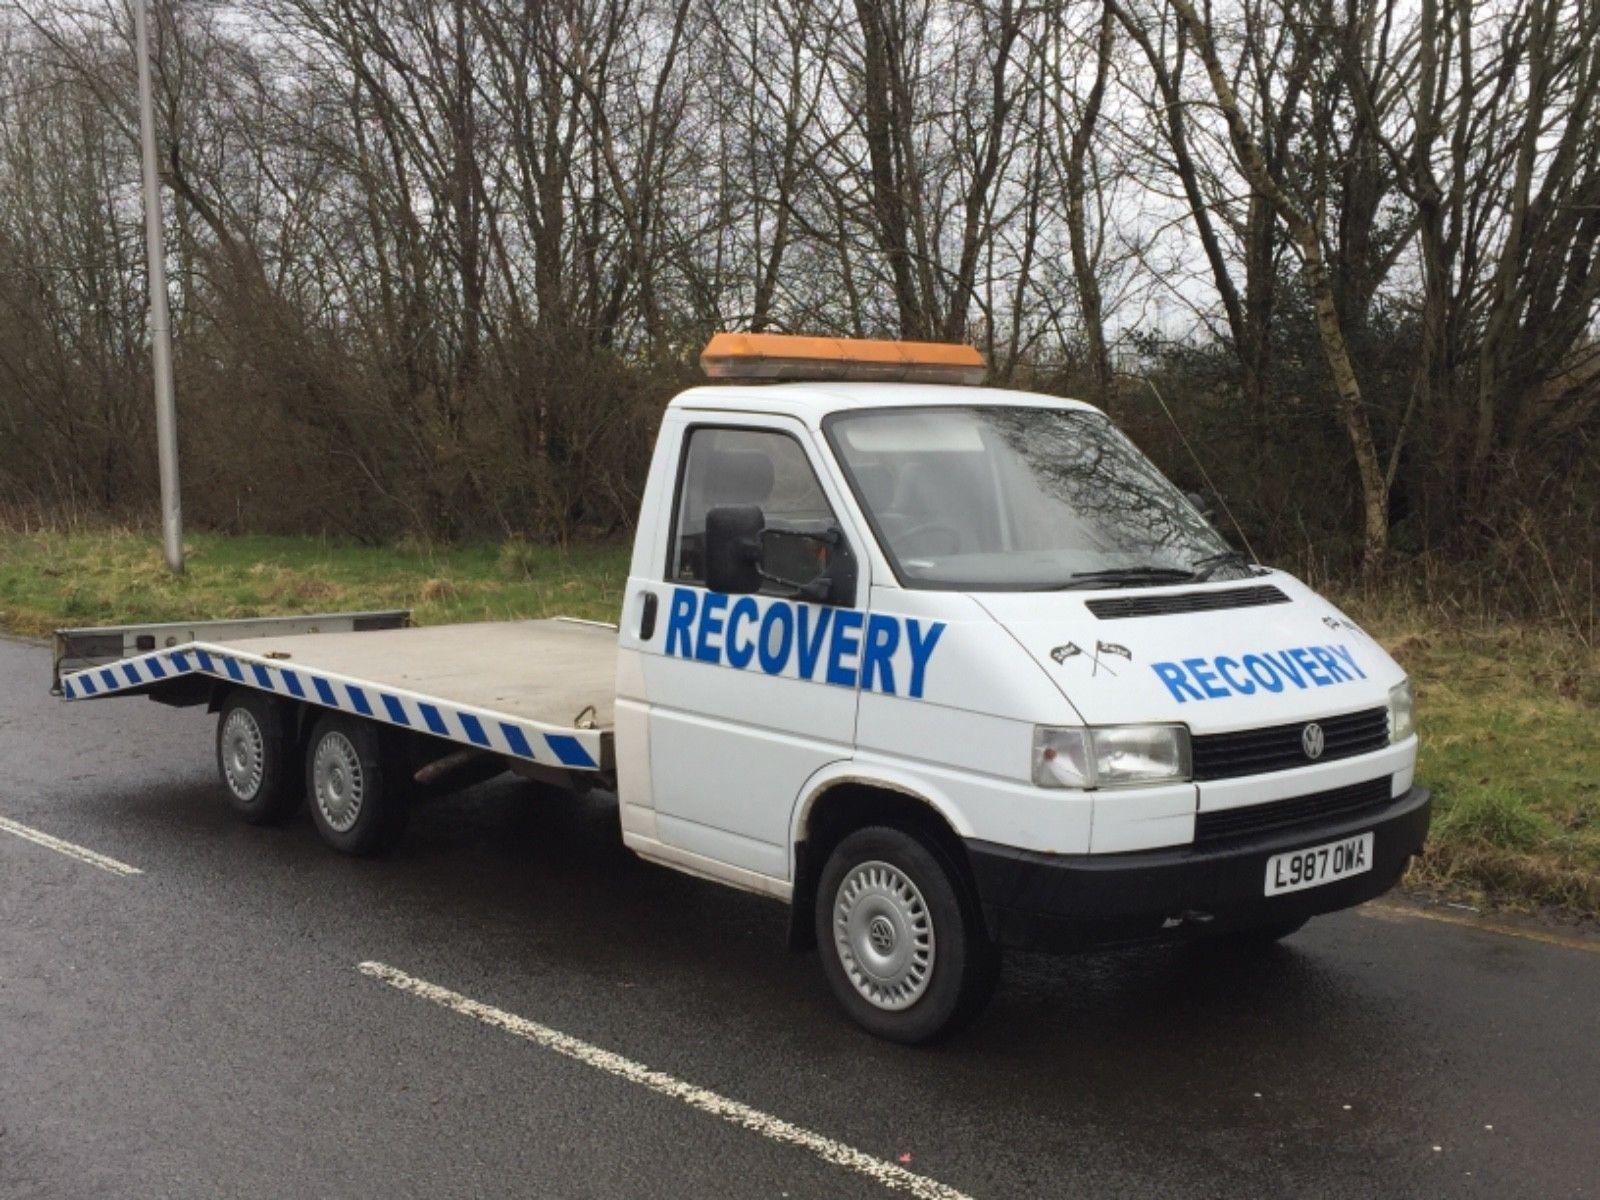 Ebay Vw T4 Transporter Lwb 2 4sel Recovery Truck Twin Rear Axles All Aluminium Bed 1990s Cars